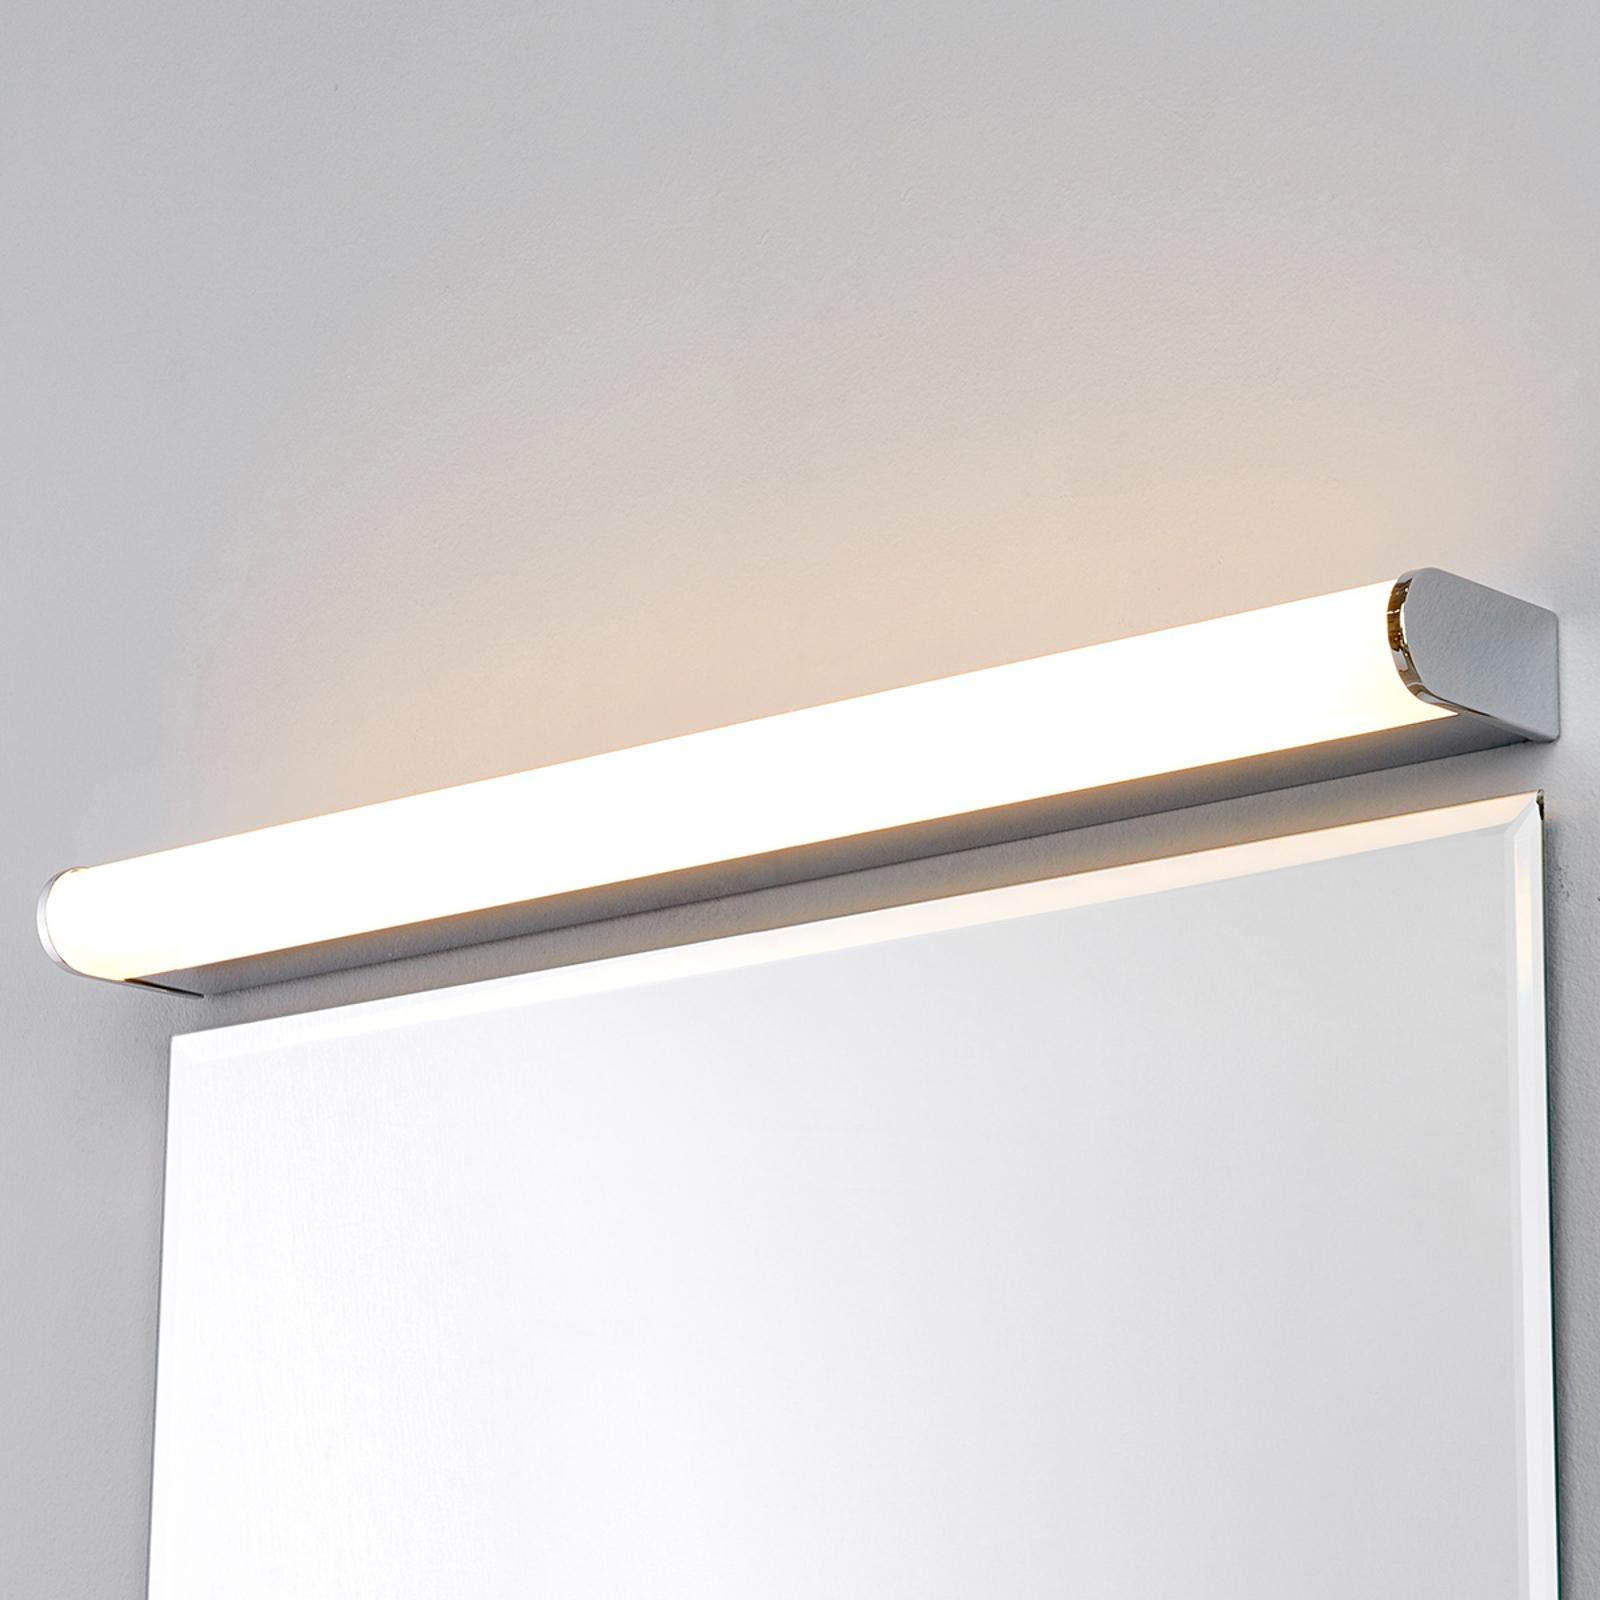 LED-badkamer-/spiegellamp Philippa halfrond 58 cm